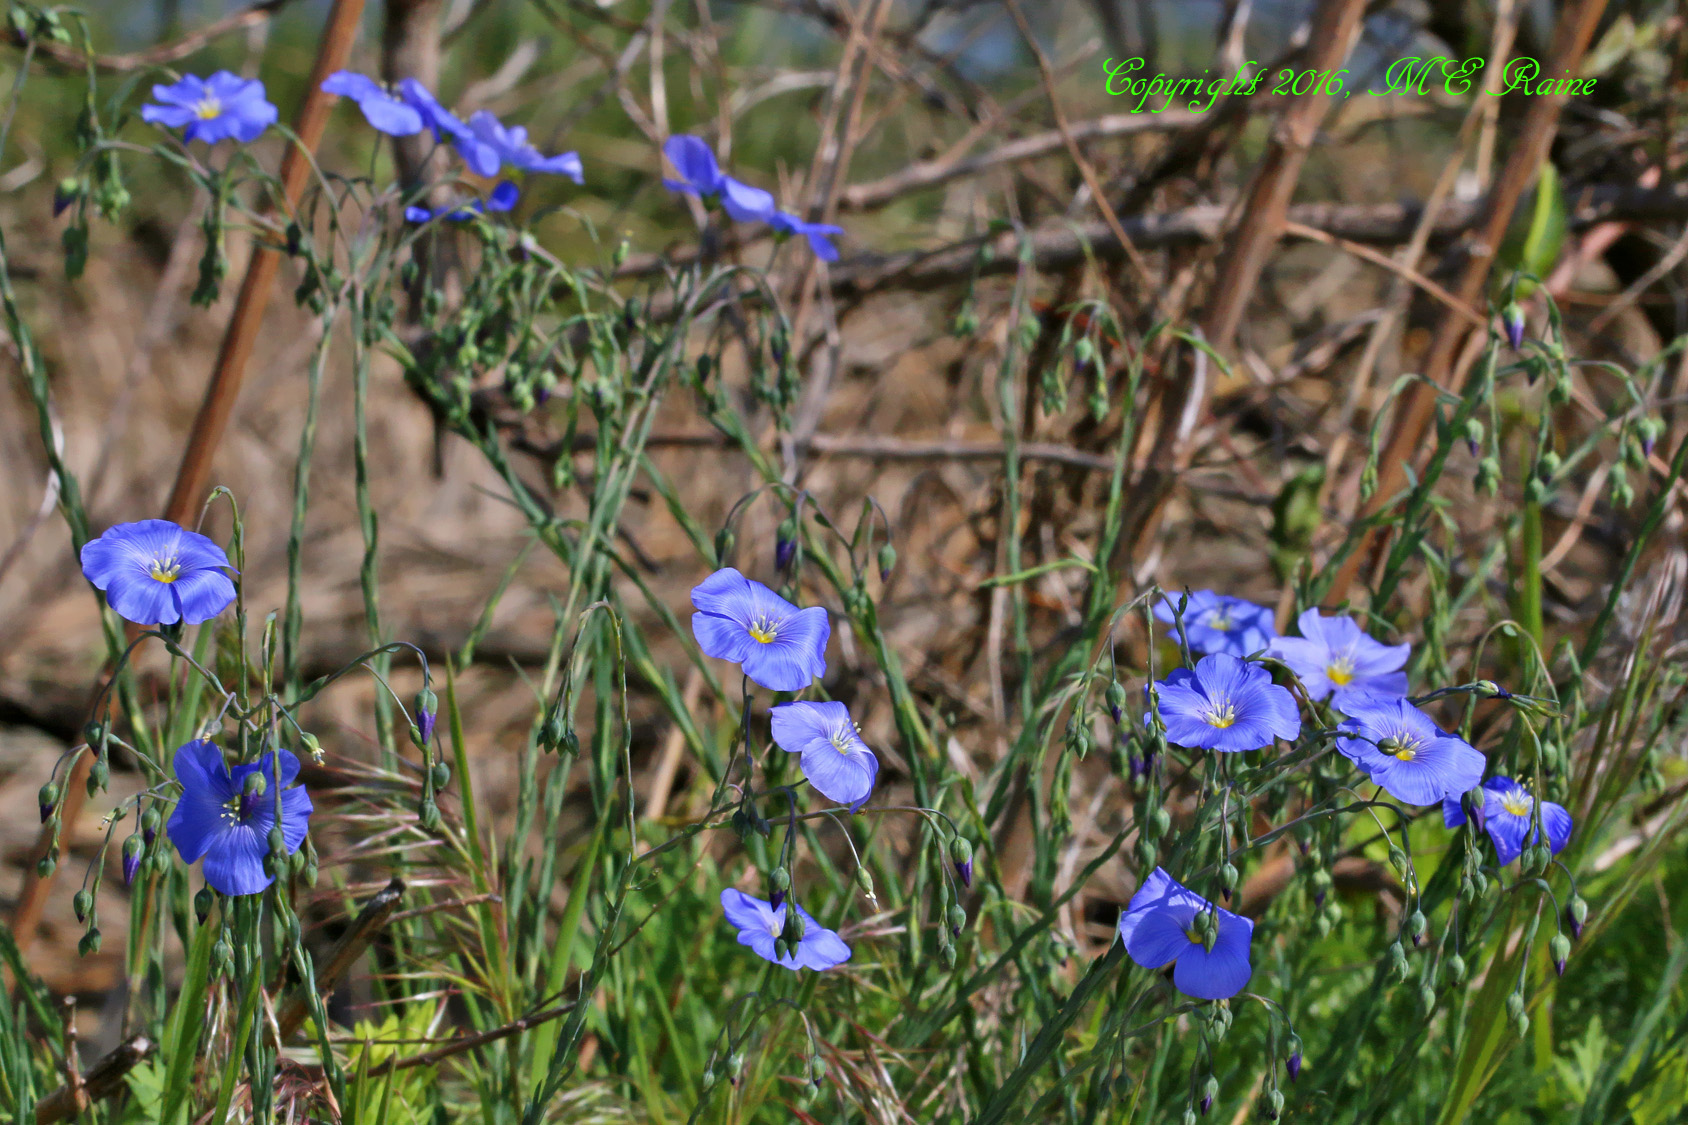 Flax Wild Blue 001af MCM Mdwlnds NJ 043016 OK FLICKR